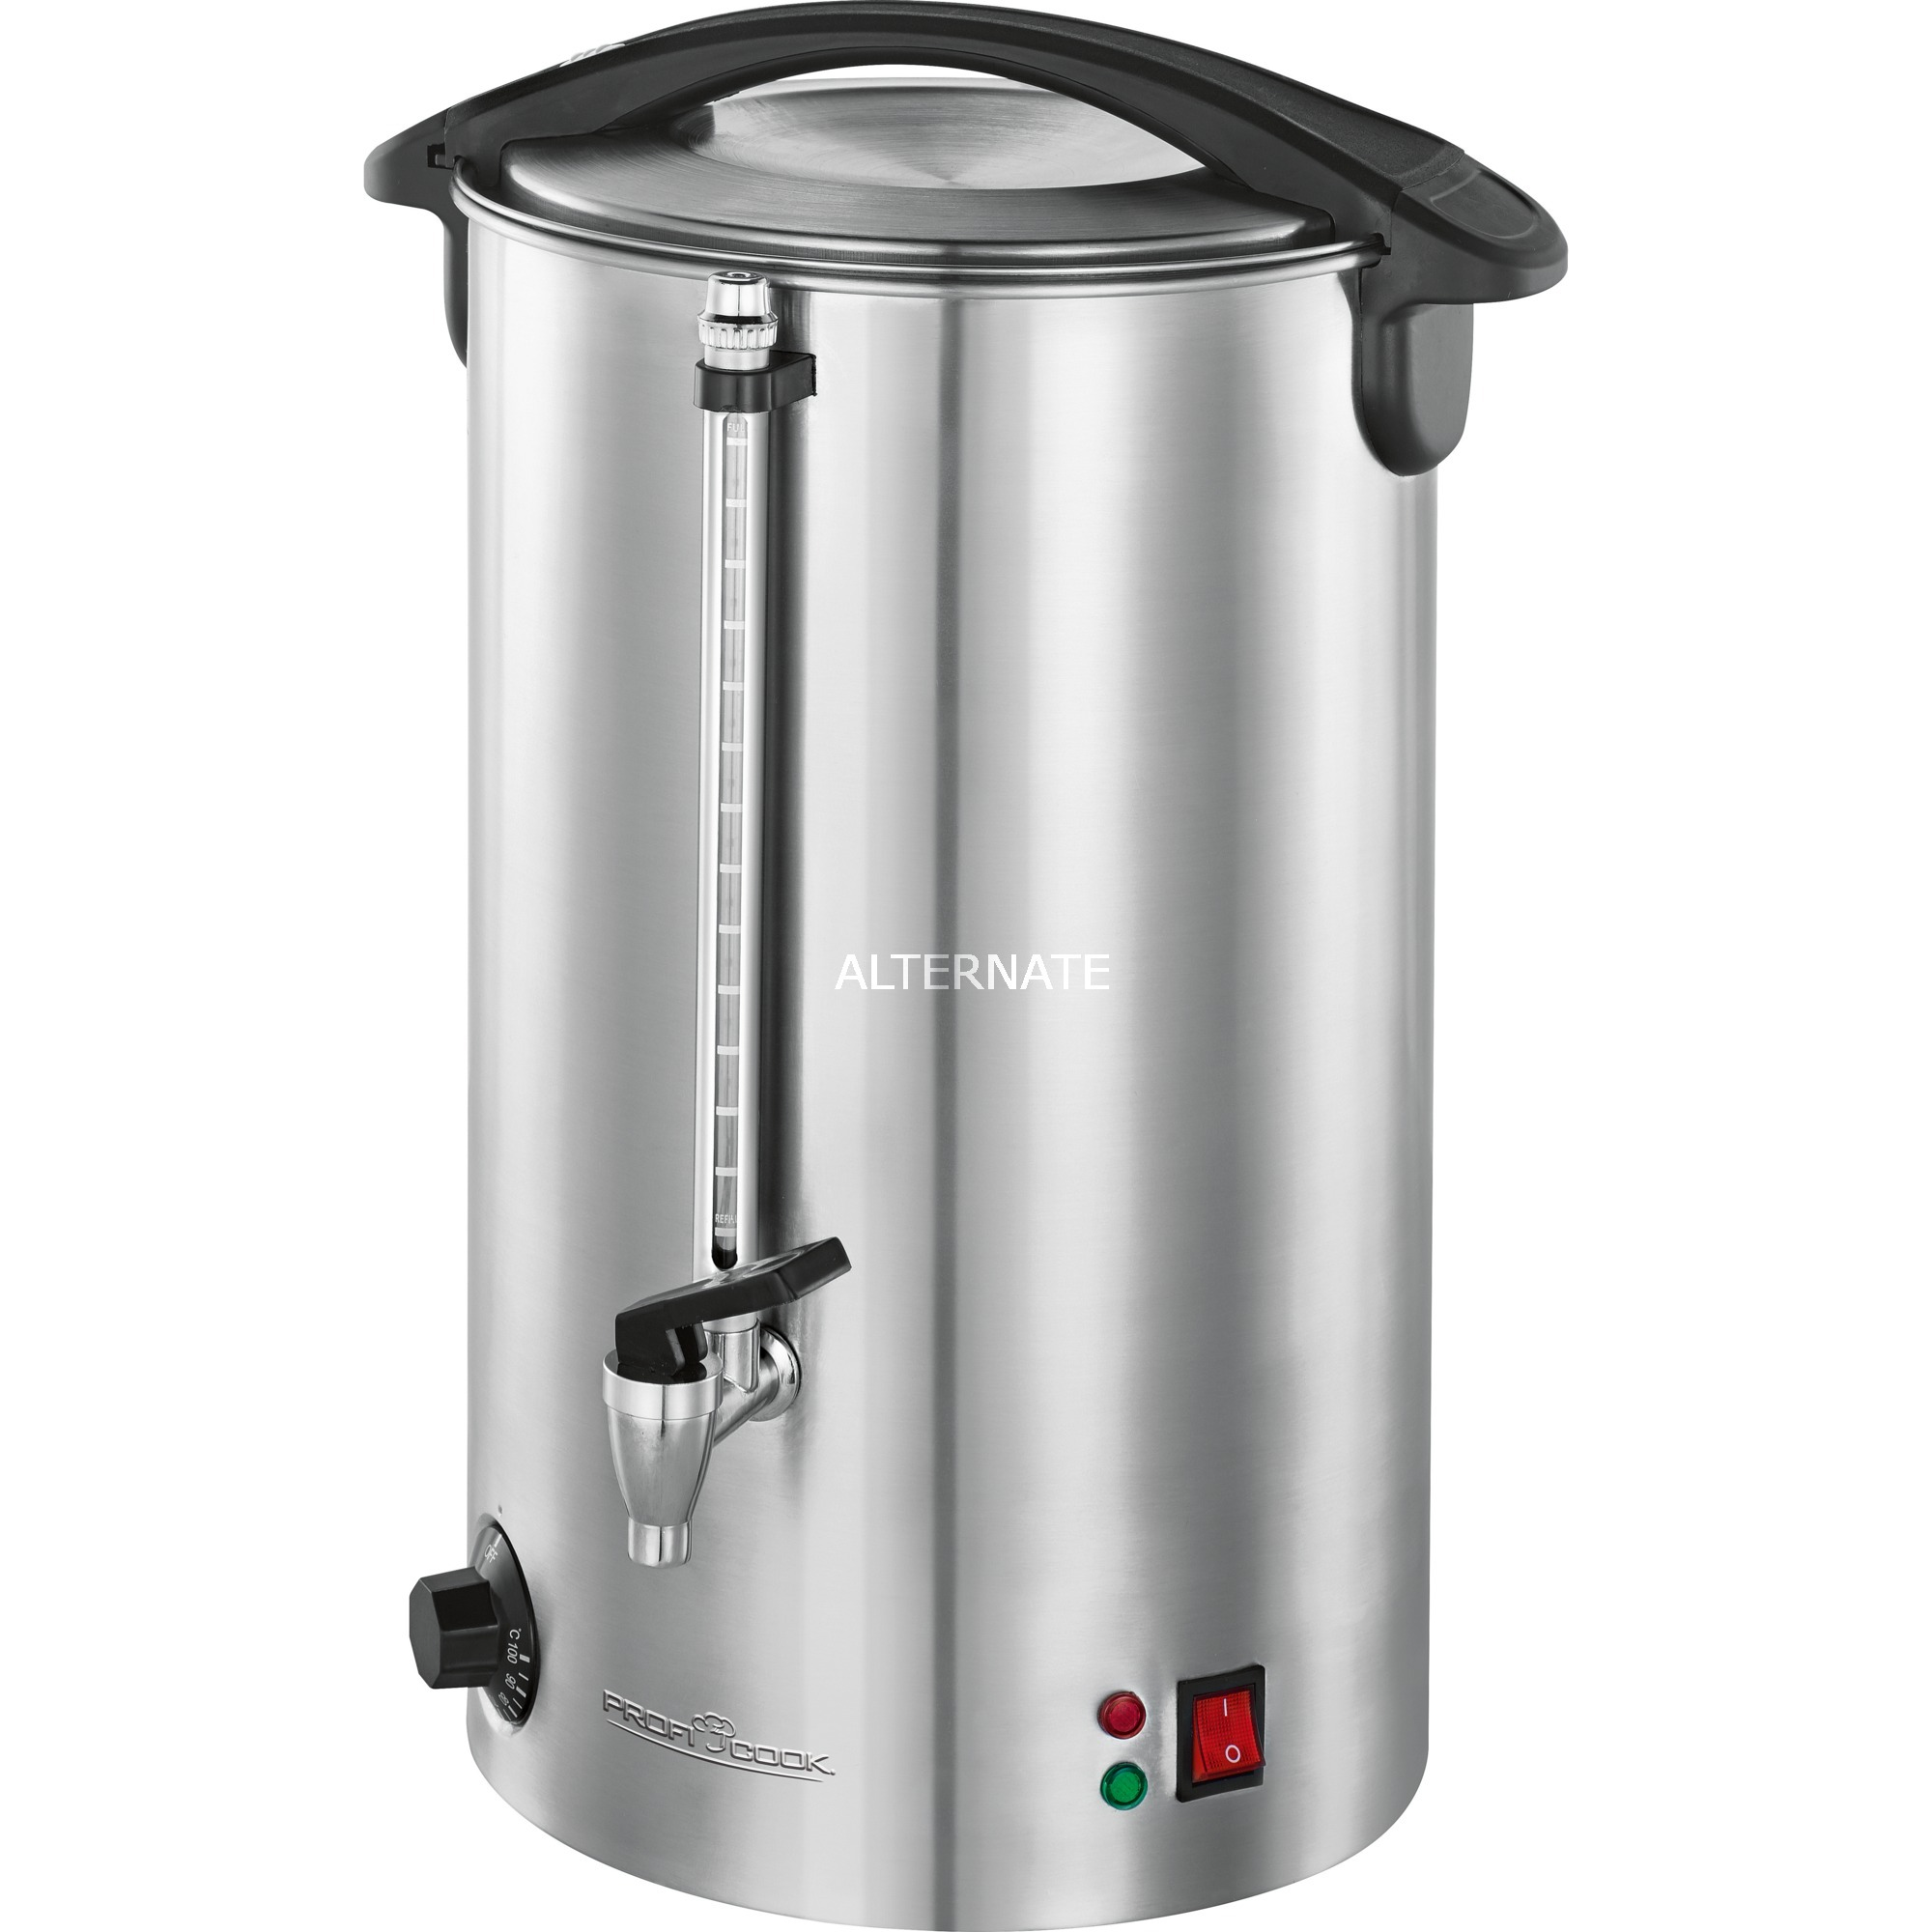 PC-HGA 1111 Bebidas calientes No aislante, Conservero automático